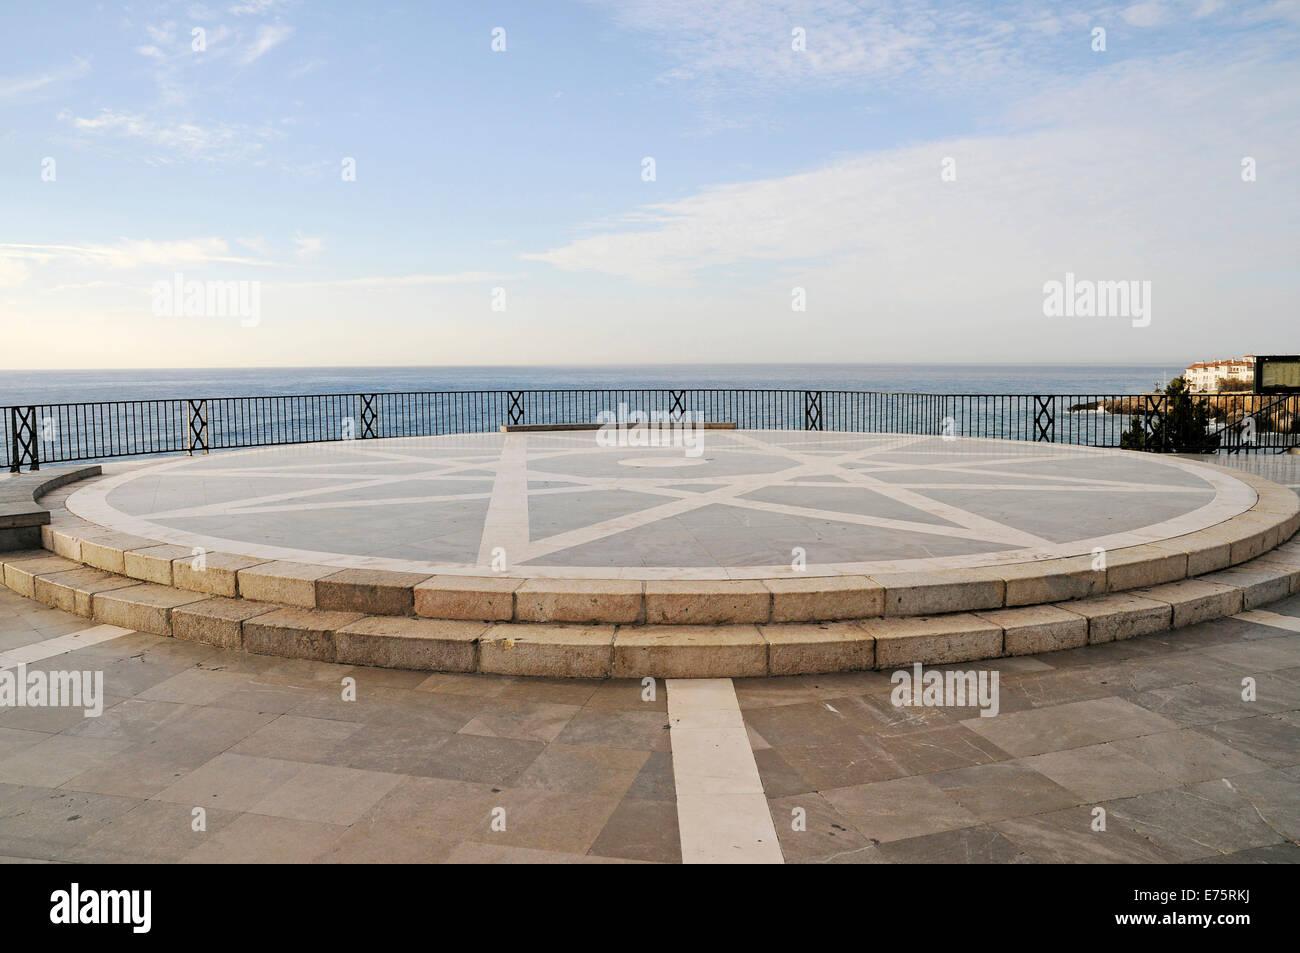 Balcon de Europa, observation deck, Nerja, Málaga Province, Costa del Sol, Andalusia, Spain - Stock Image